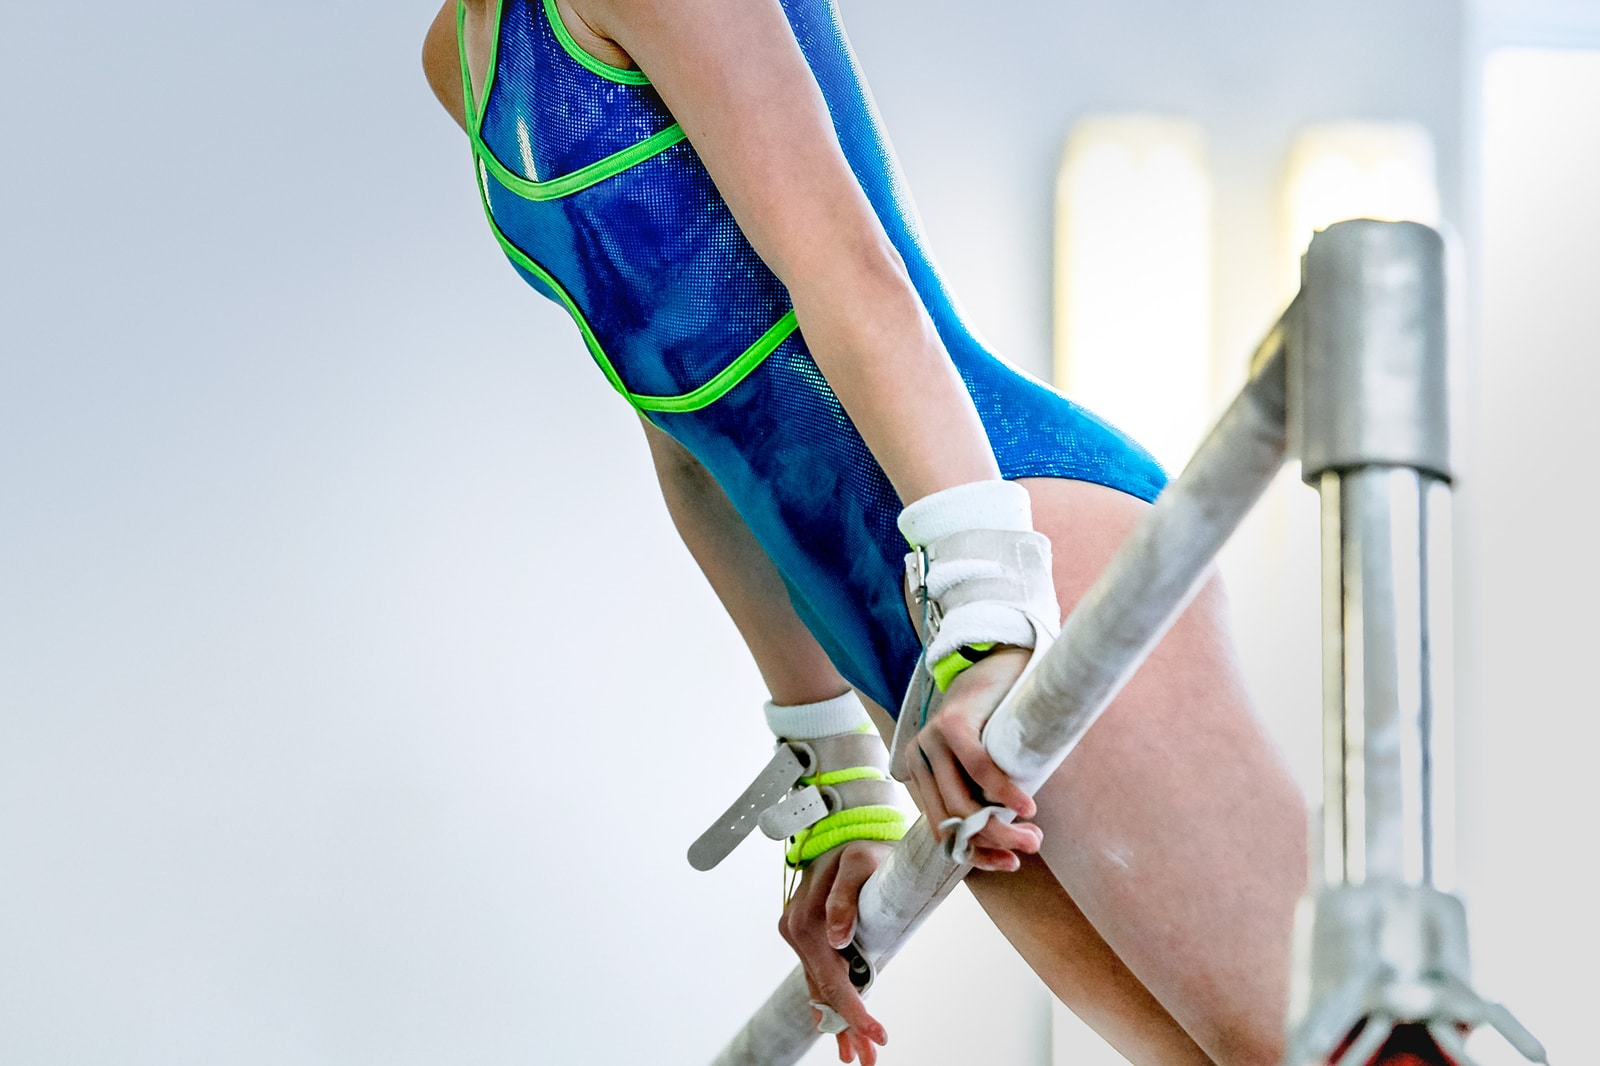 gimnasta olímpica mexicana alexa moreno